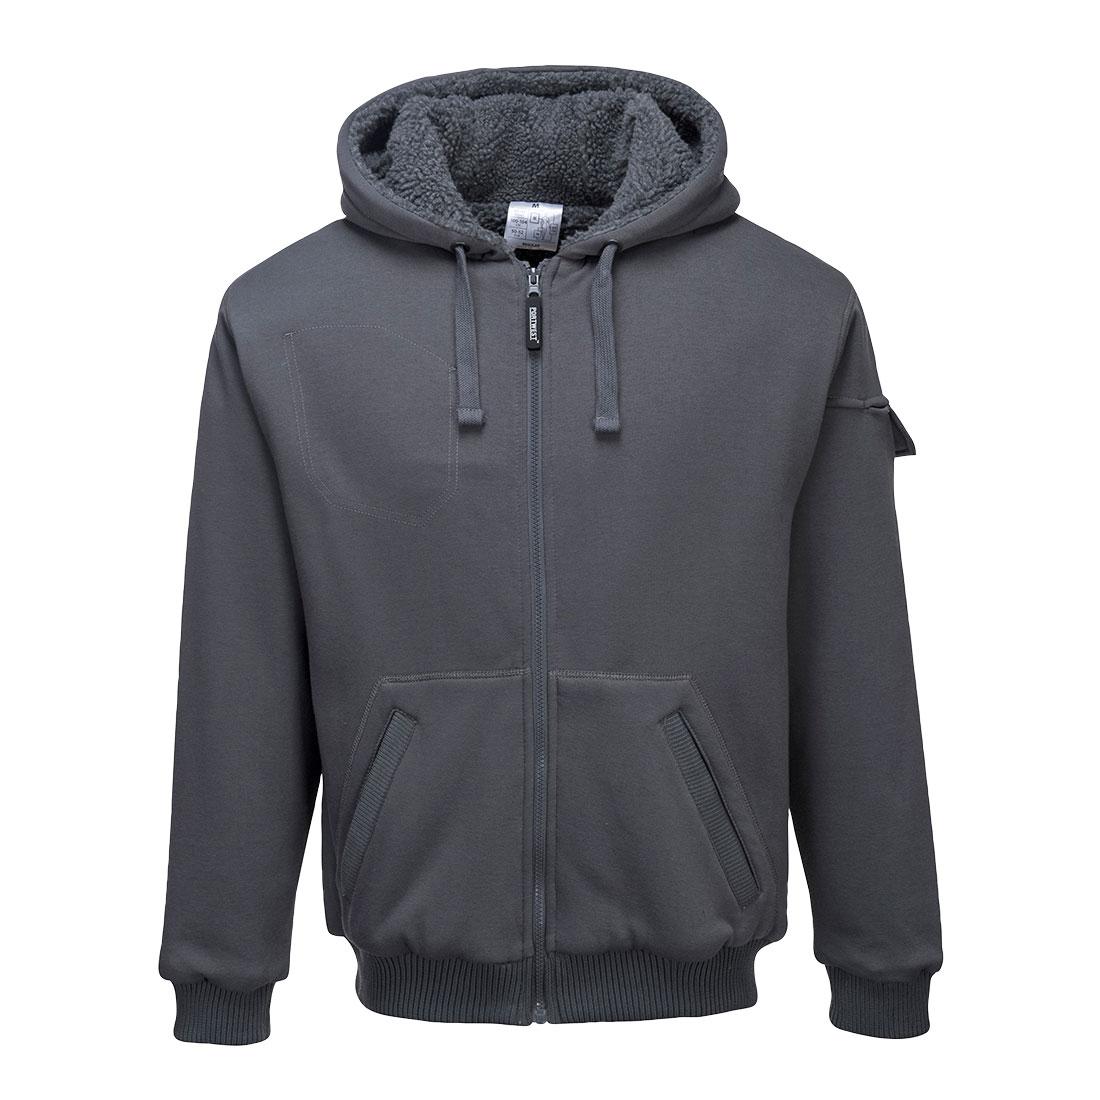 Pewter Jacket Zoom Grey SR